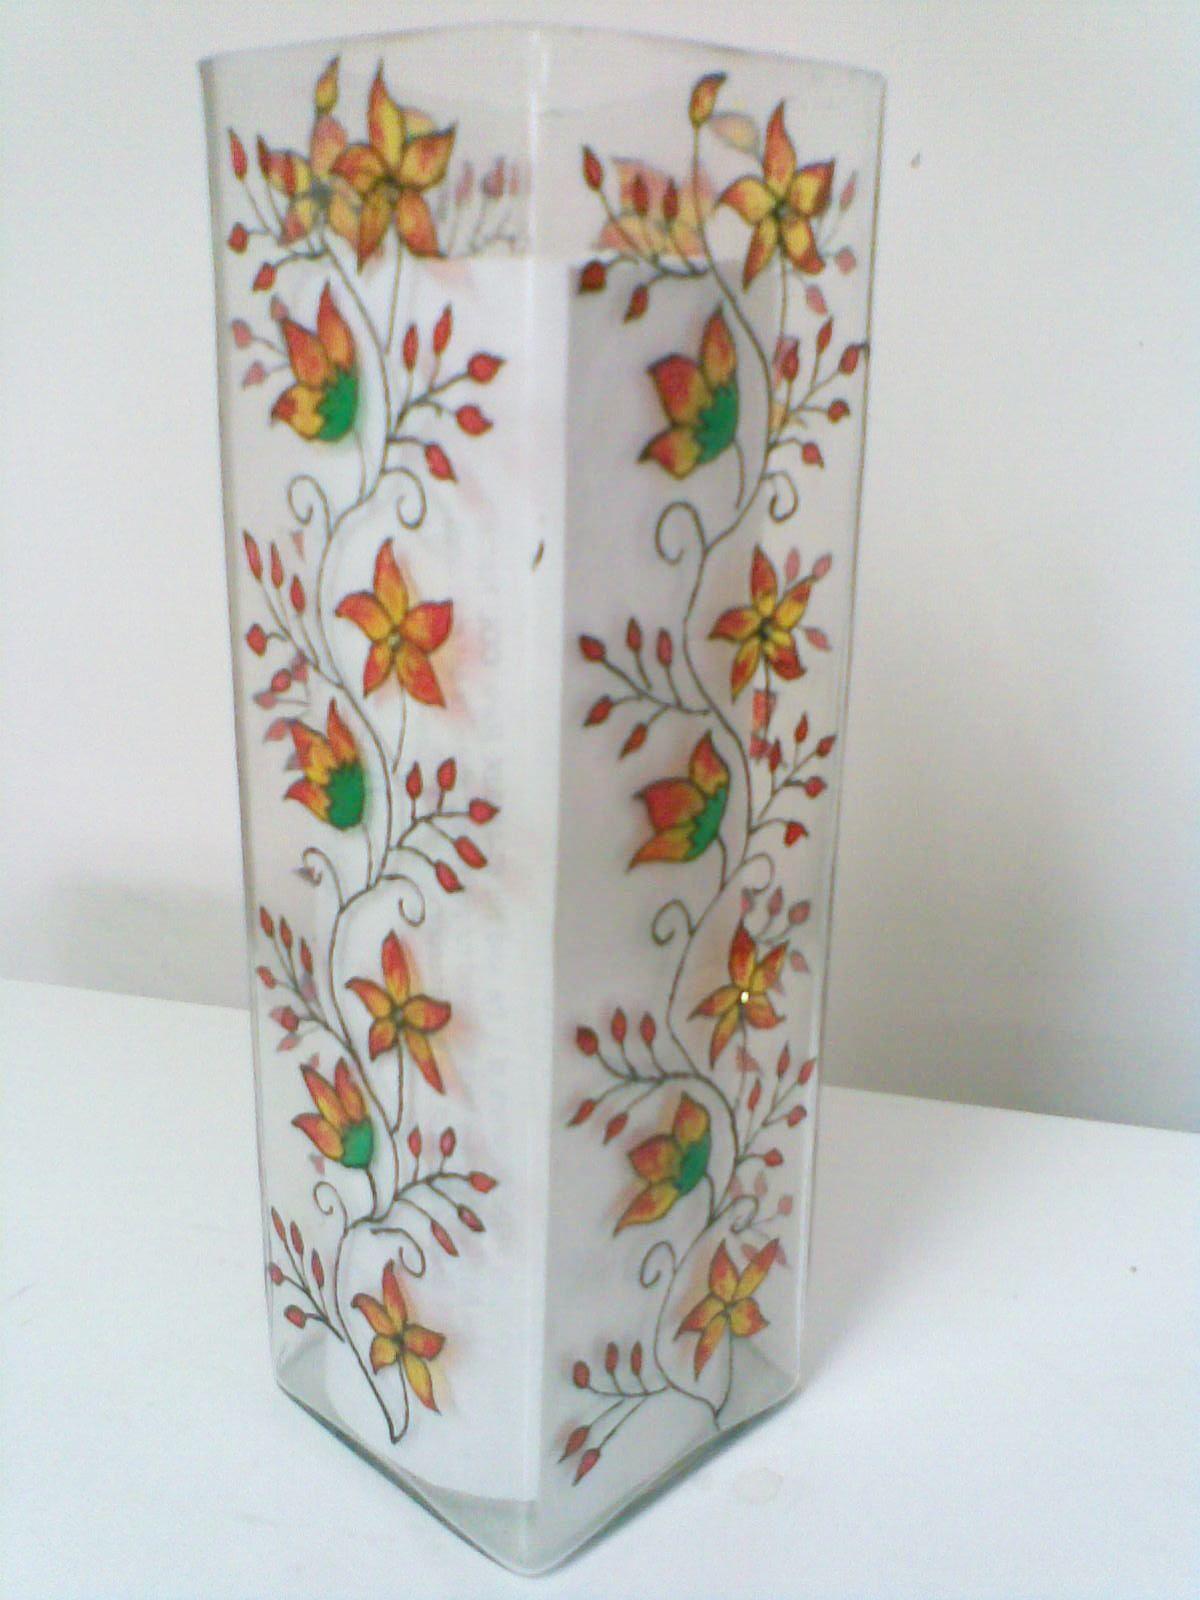 Abstract hand painted vases farah art creations vases abstract hand painted vases farah art creations reviewsmspy